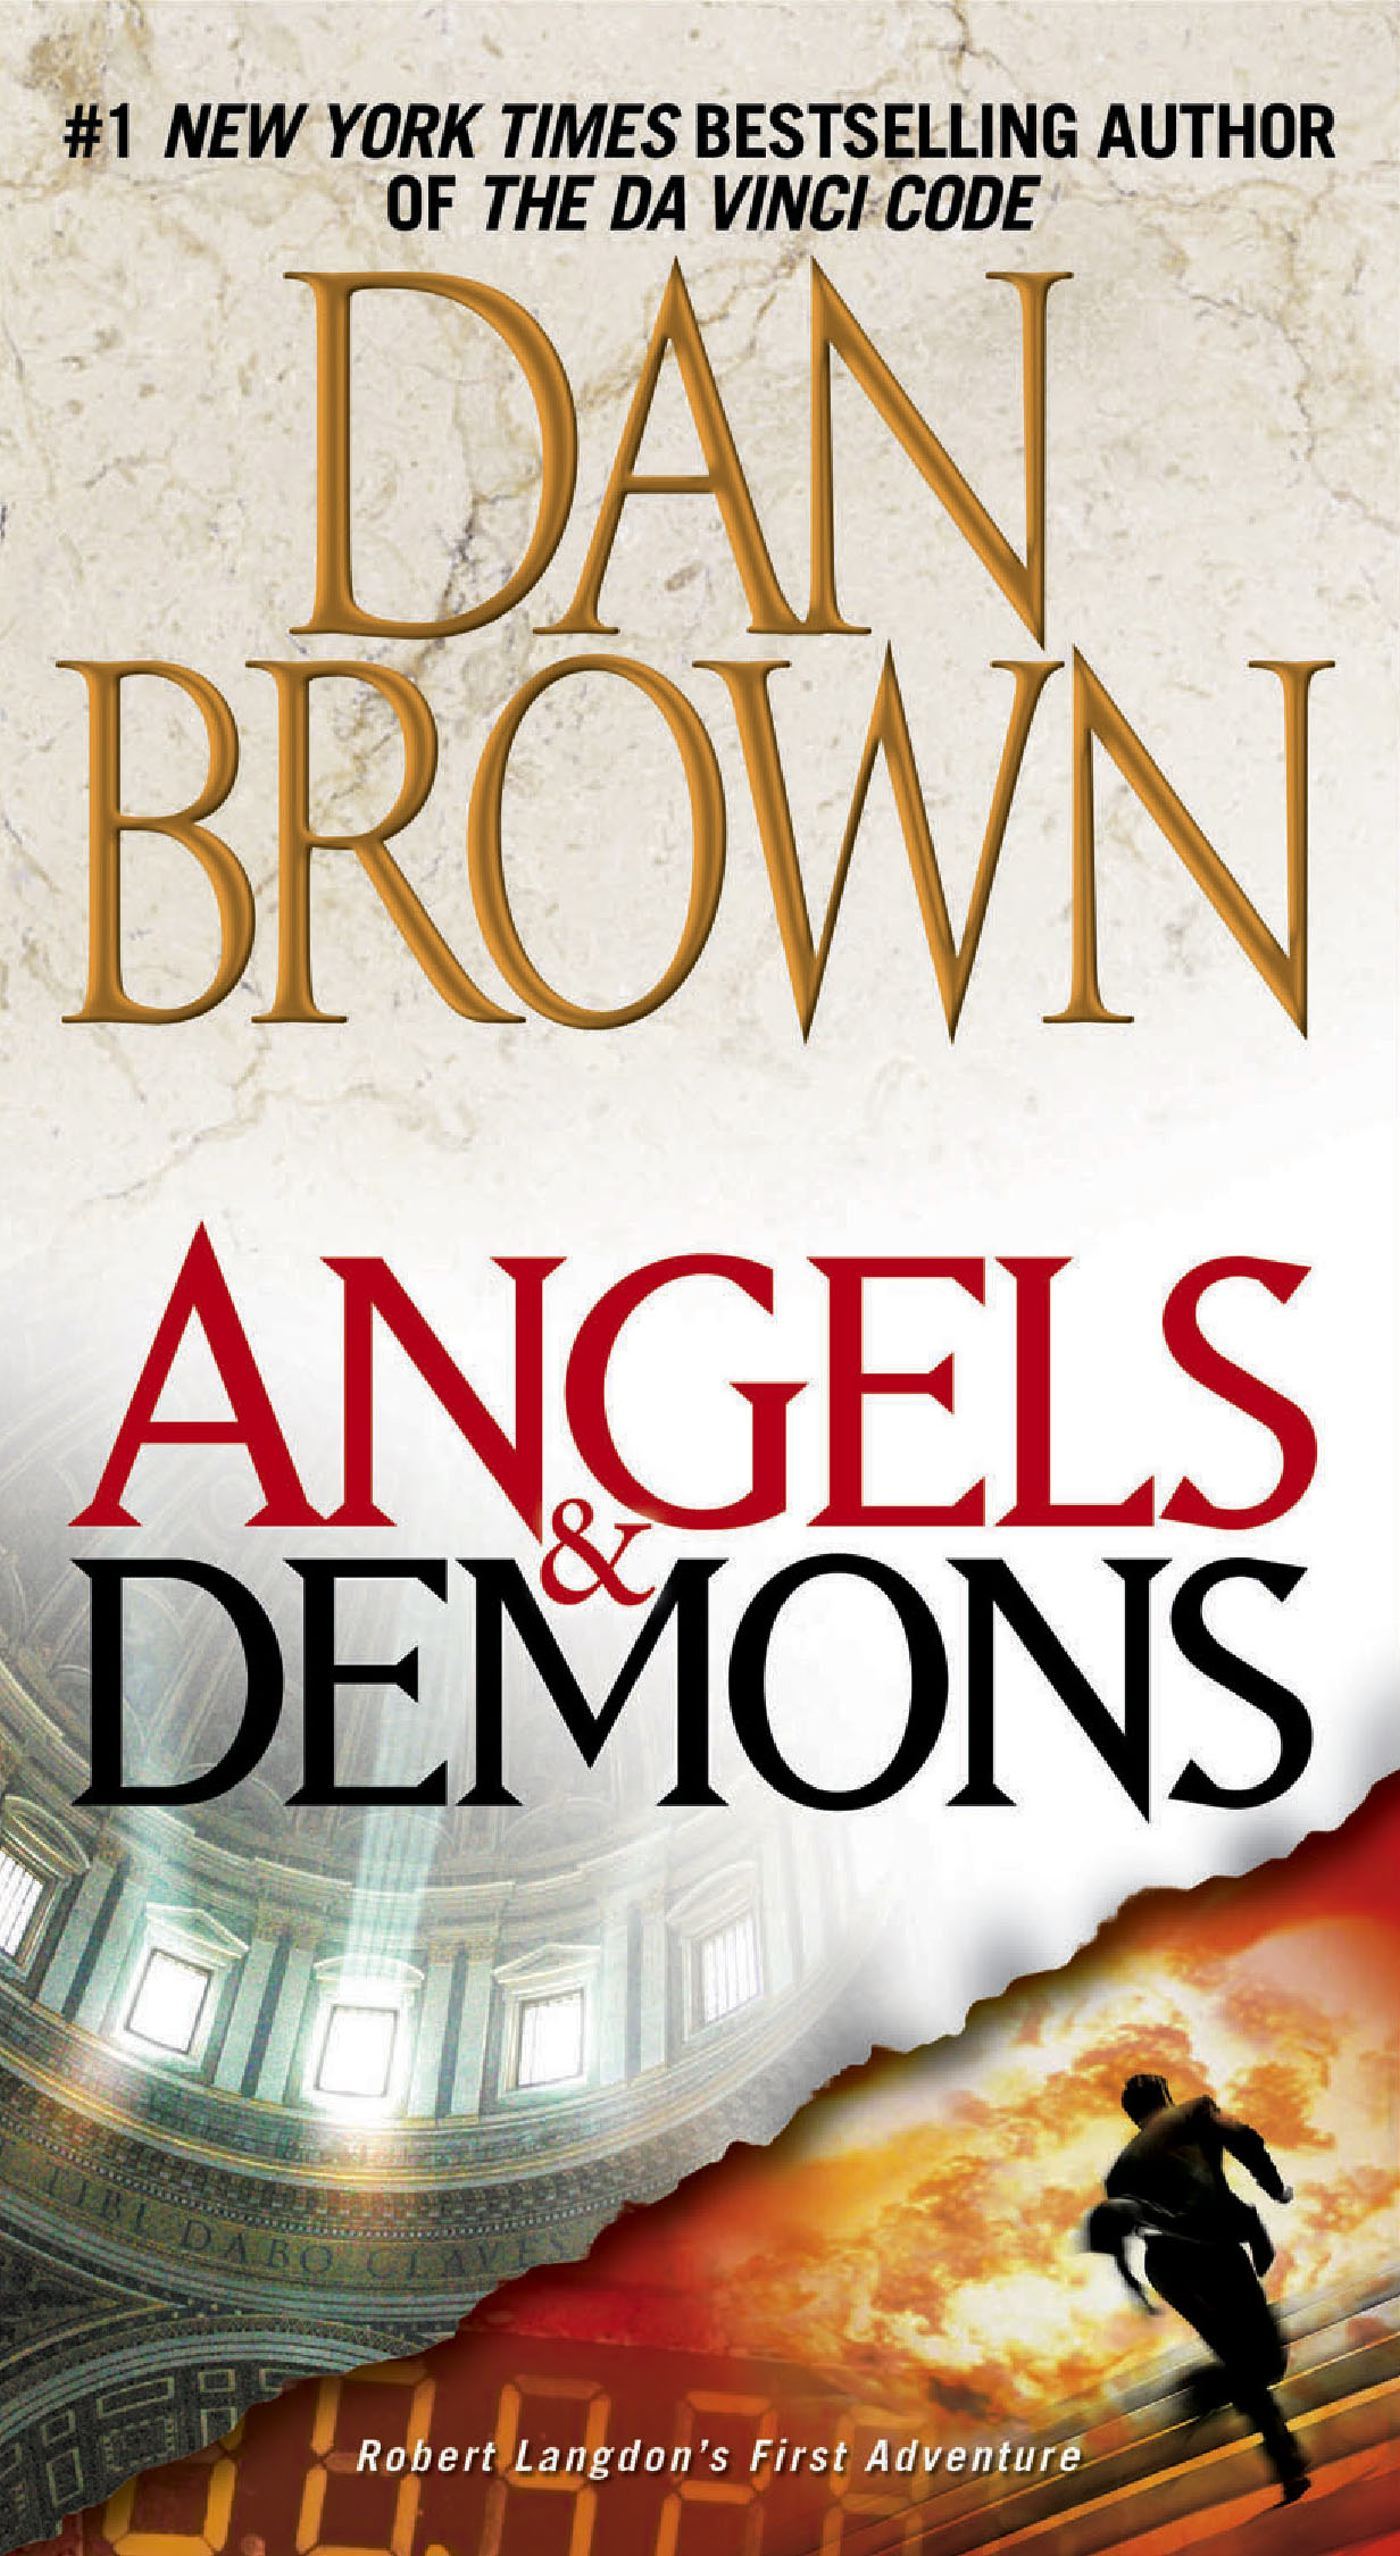 Angels and Demons by Dan Brown.